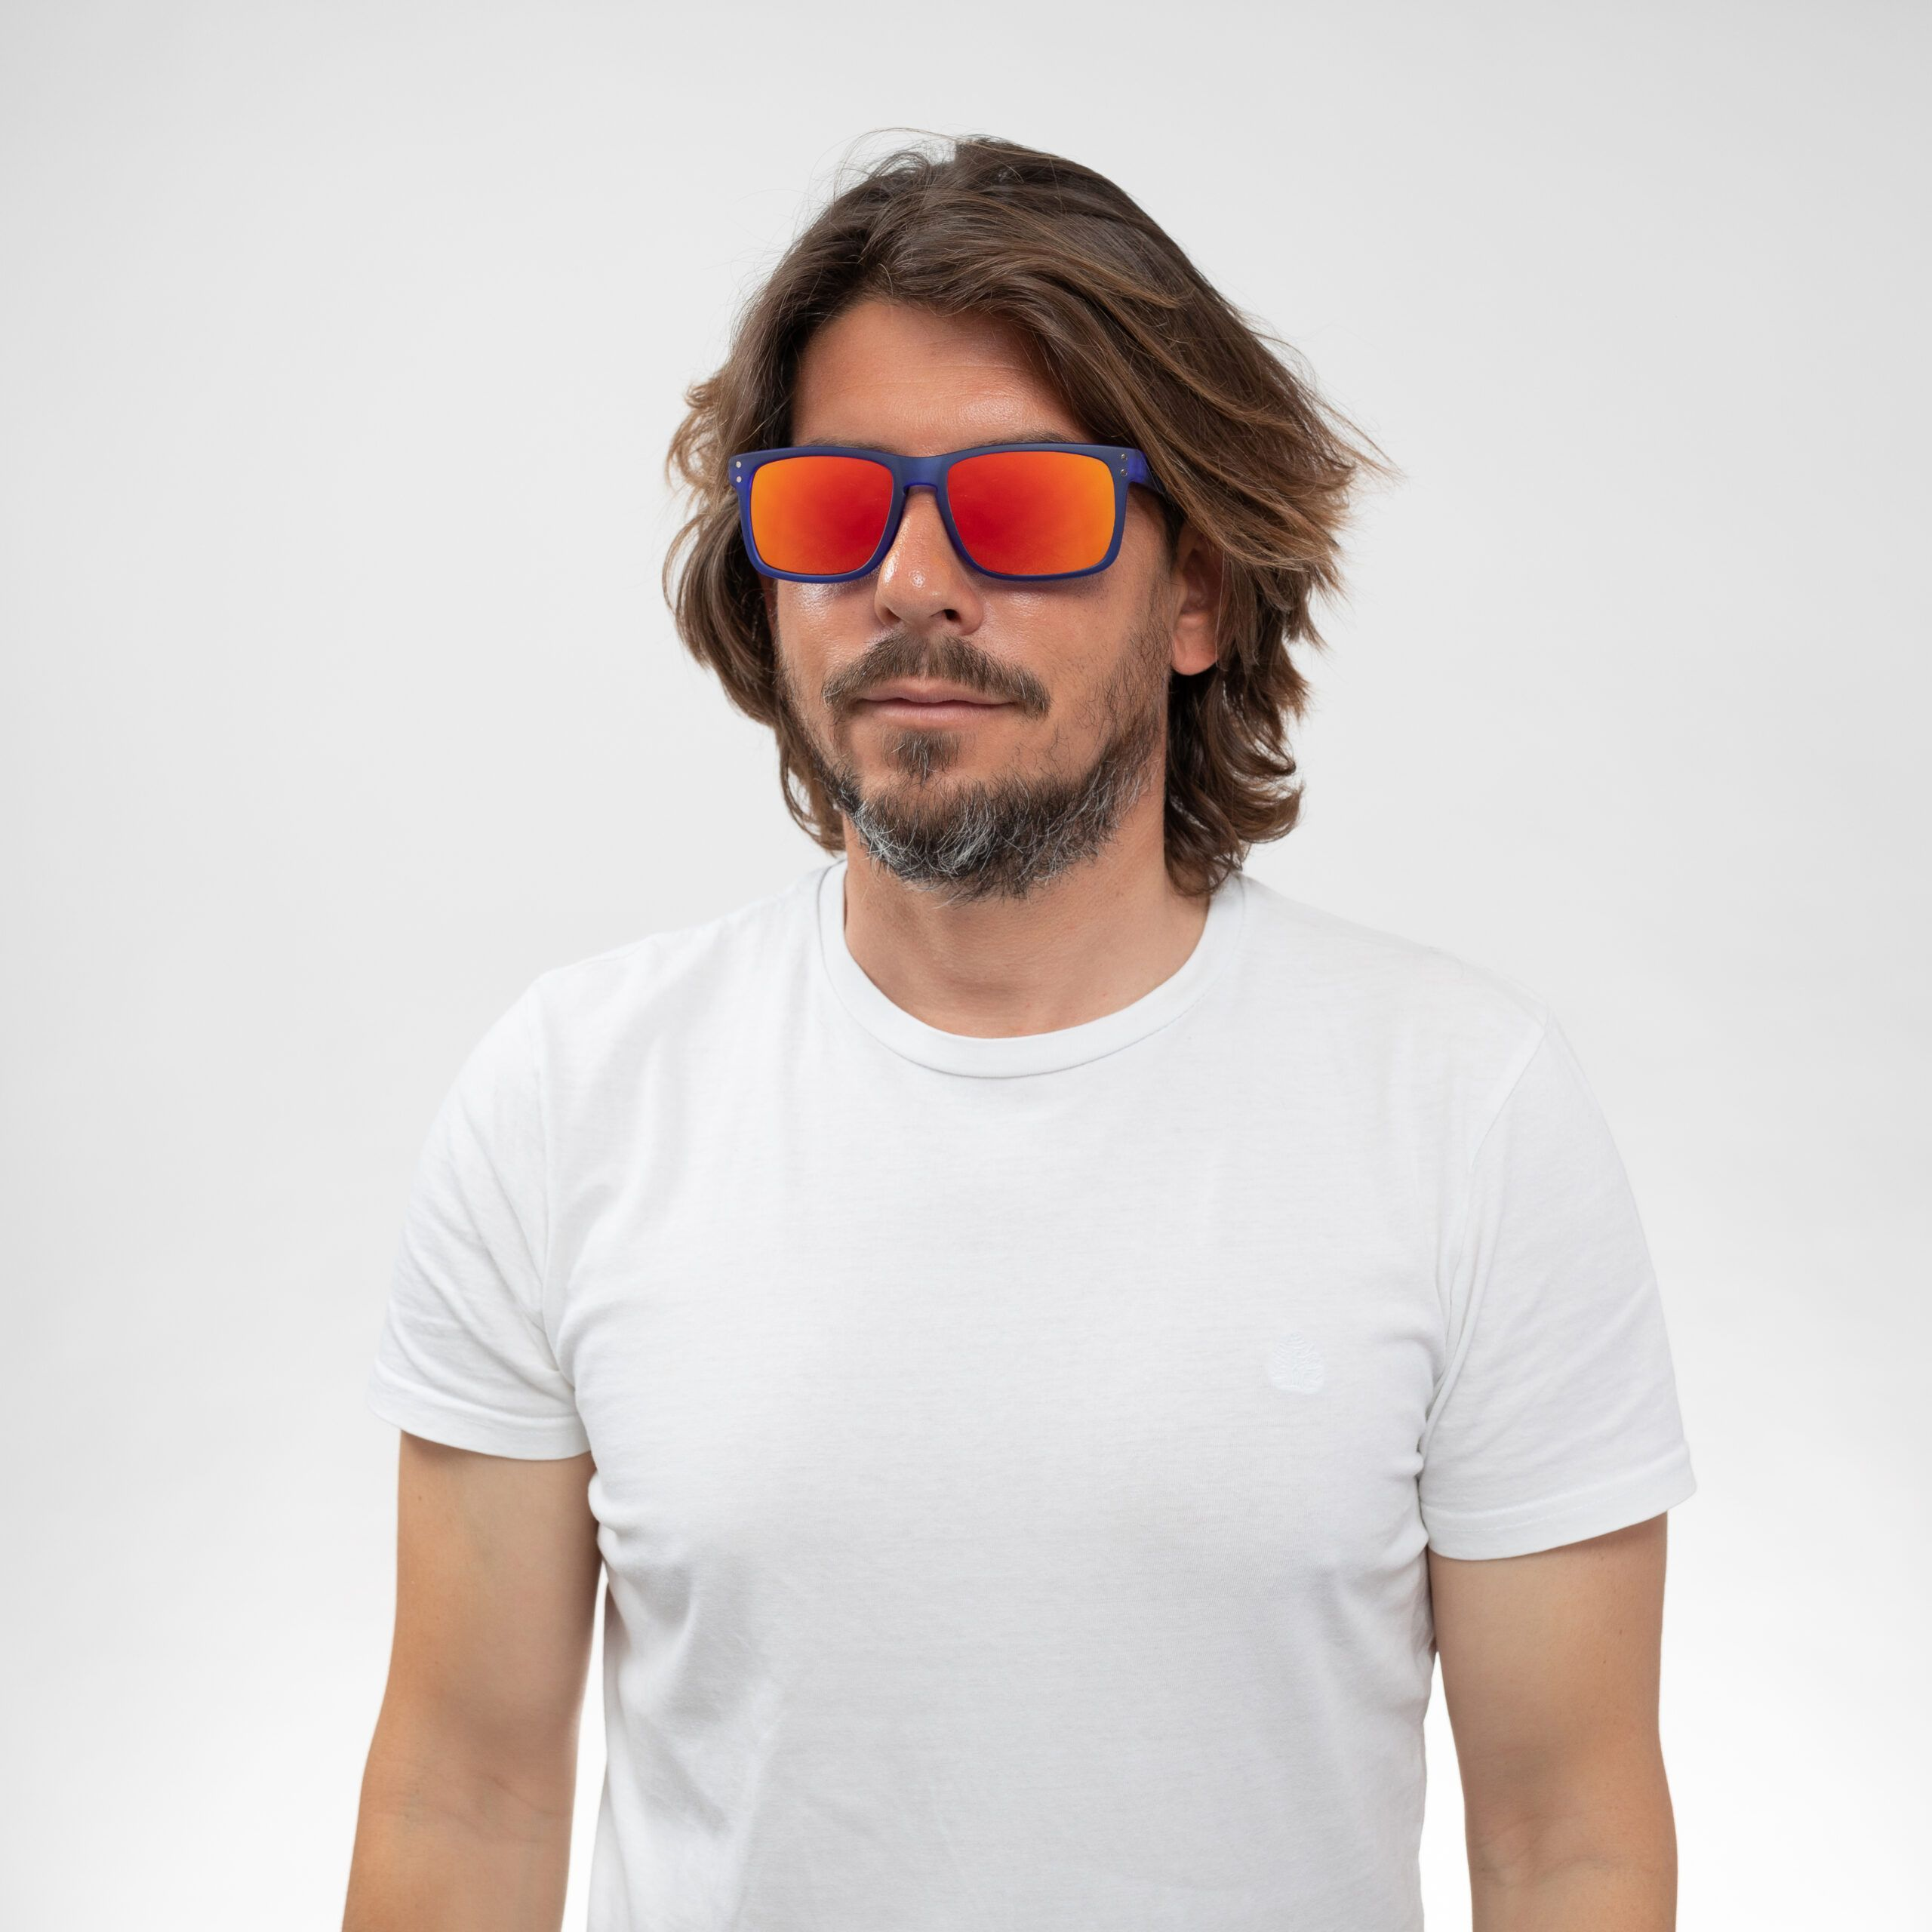 Gafas-de-sol-Liive16-2-scaled CHEAP THRILL MIRROR MATT XTAL NEON